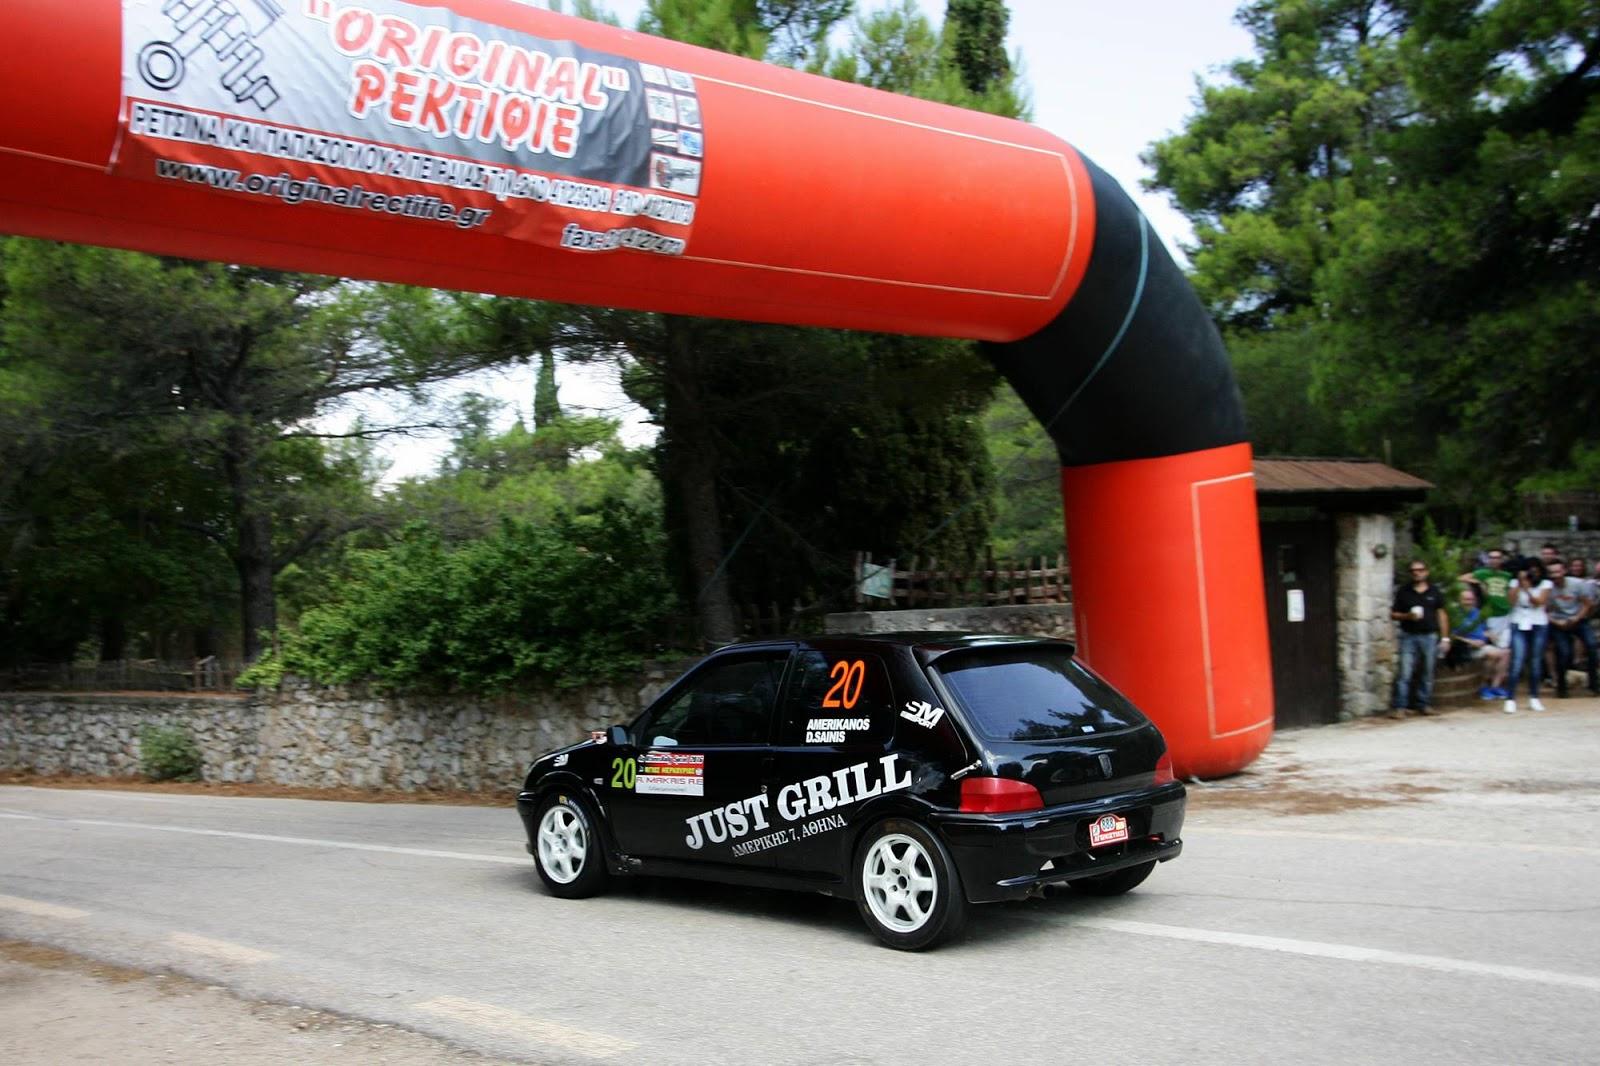 25CE259125CE25BC25CE25B525CF258125CE25B925CE25BA25CE25AC25CE25BD25CE25BF25CF2582 25CE25A325CE25B125CE259025CE25BD25CE25B725CF2582 Ολοκληρώθηκε το 4ο Athens Rally Sprint με νικητή τον Πλάγο με Honda Civic Type-R